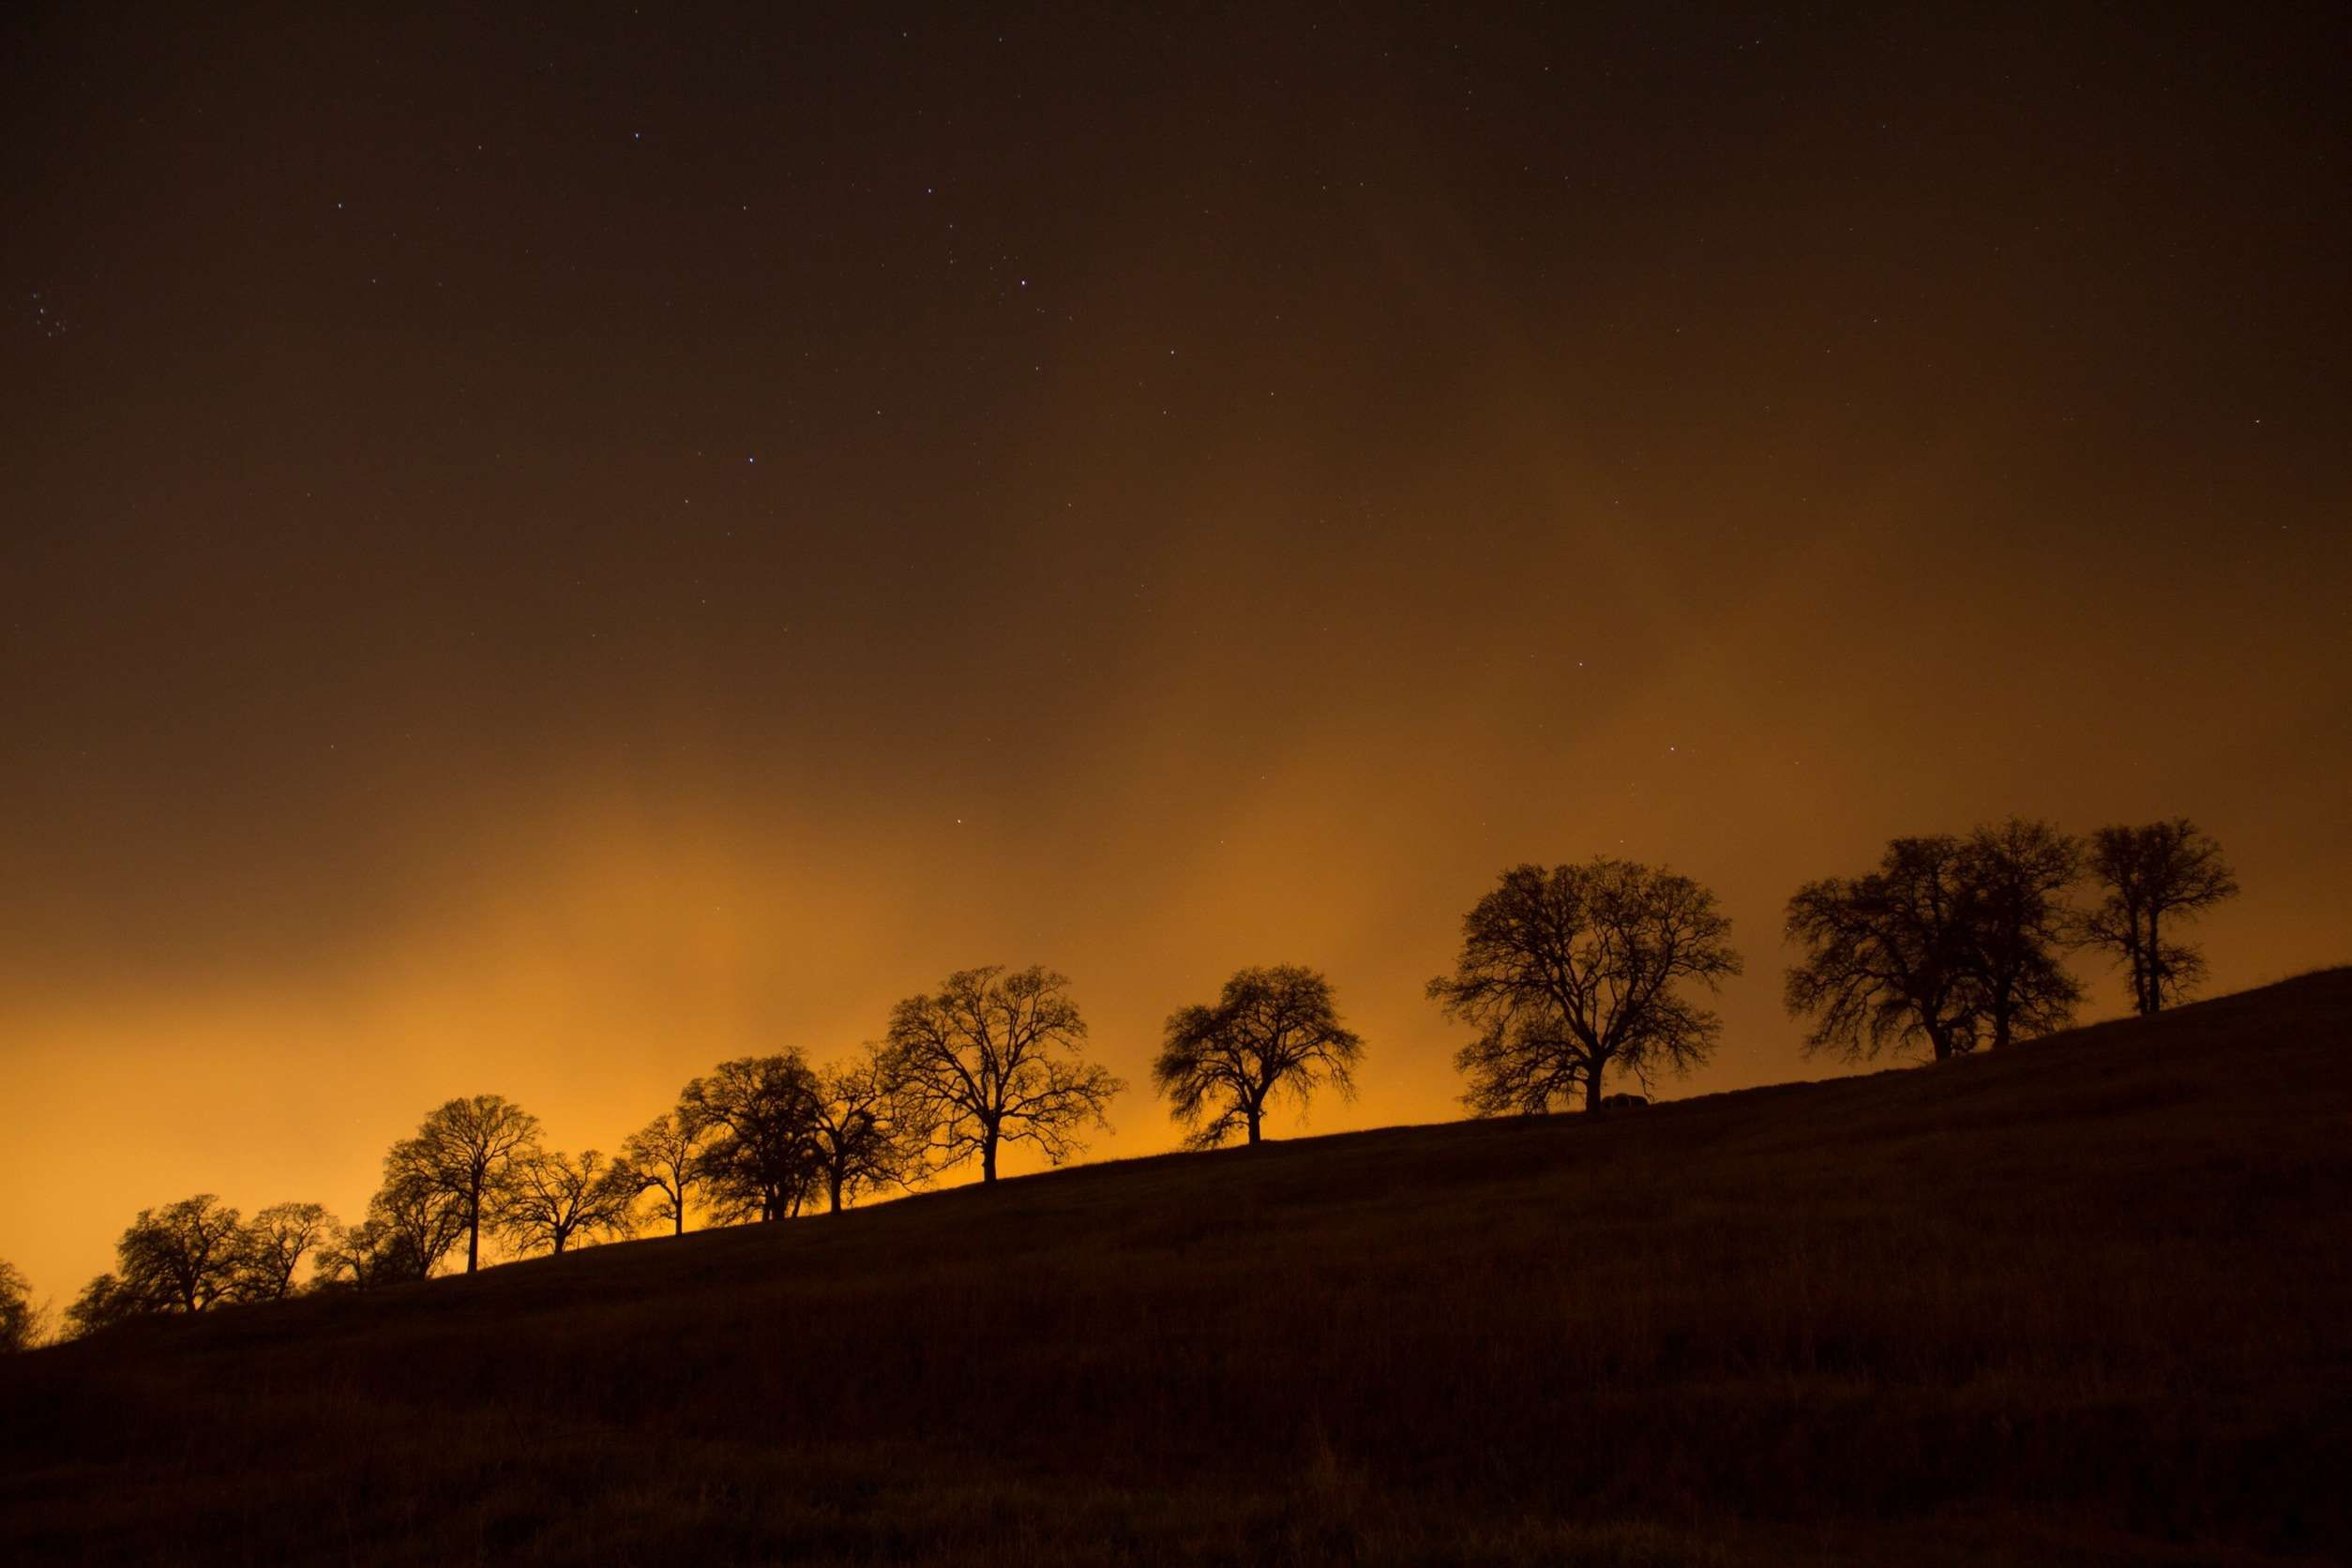 #dusk #night #silhouette #sky #stars #trees